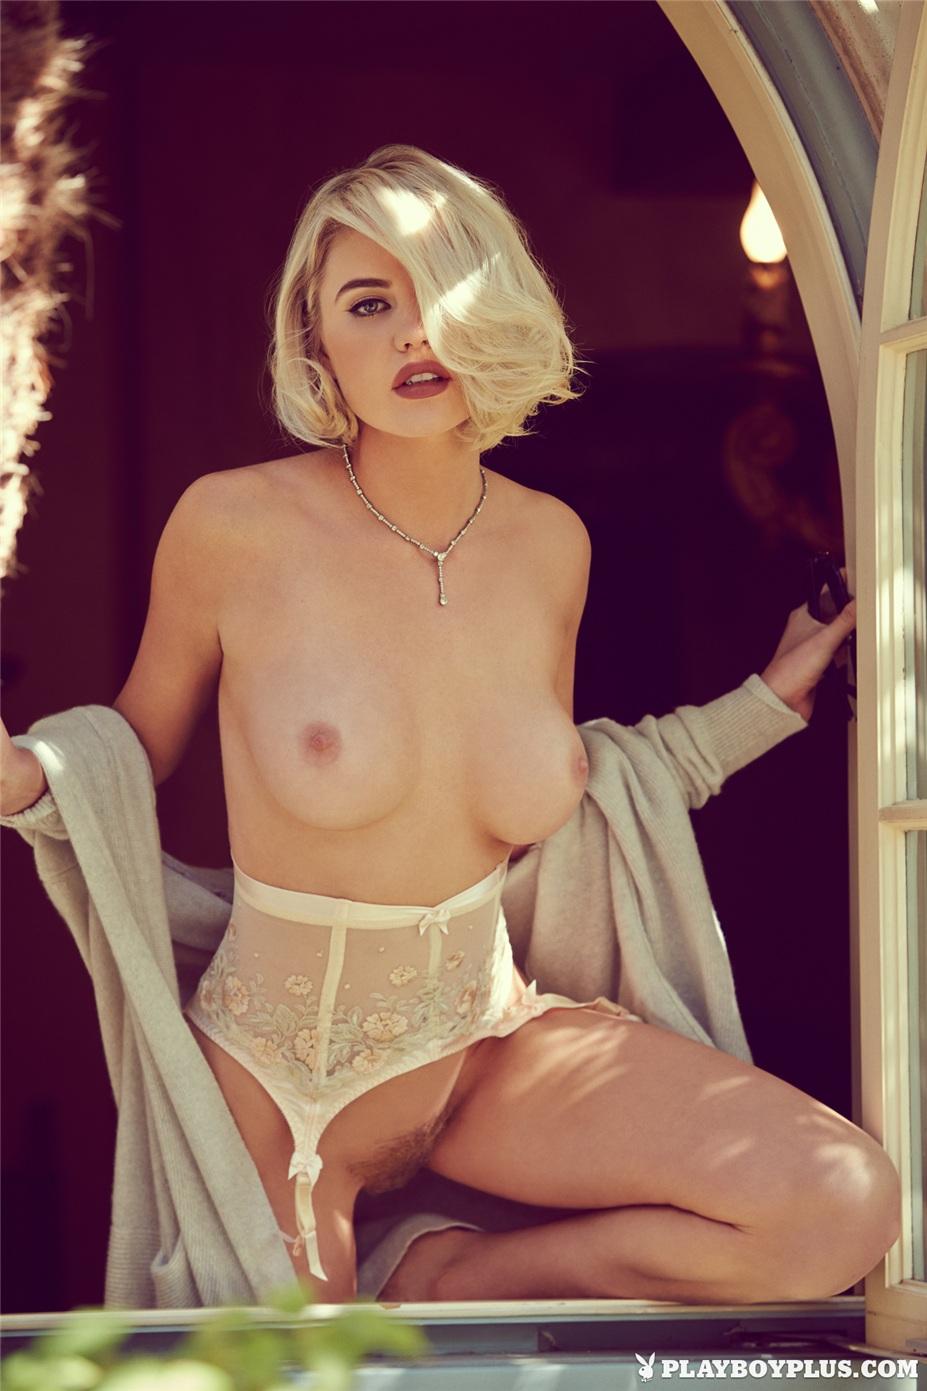 Девушка месяца Кейсли Коллинс / Kayslee Collins - Playboy USA Miss February 2015 / All play